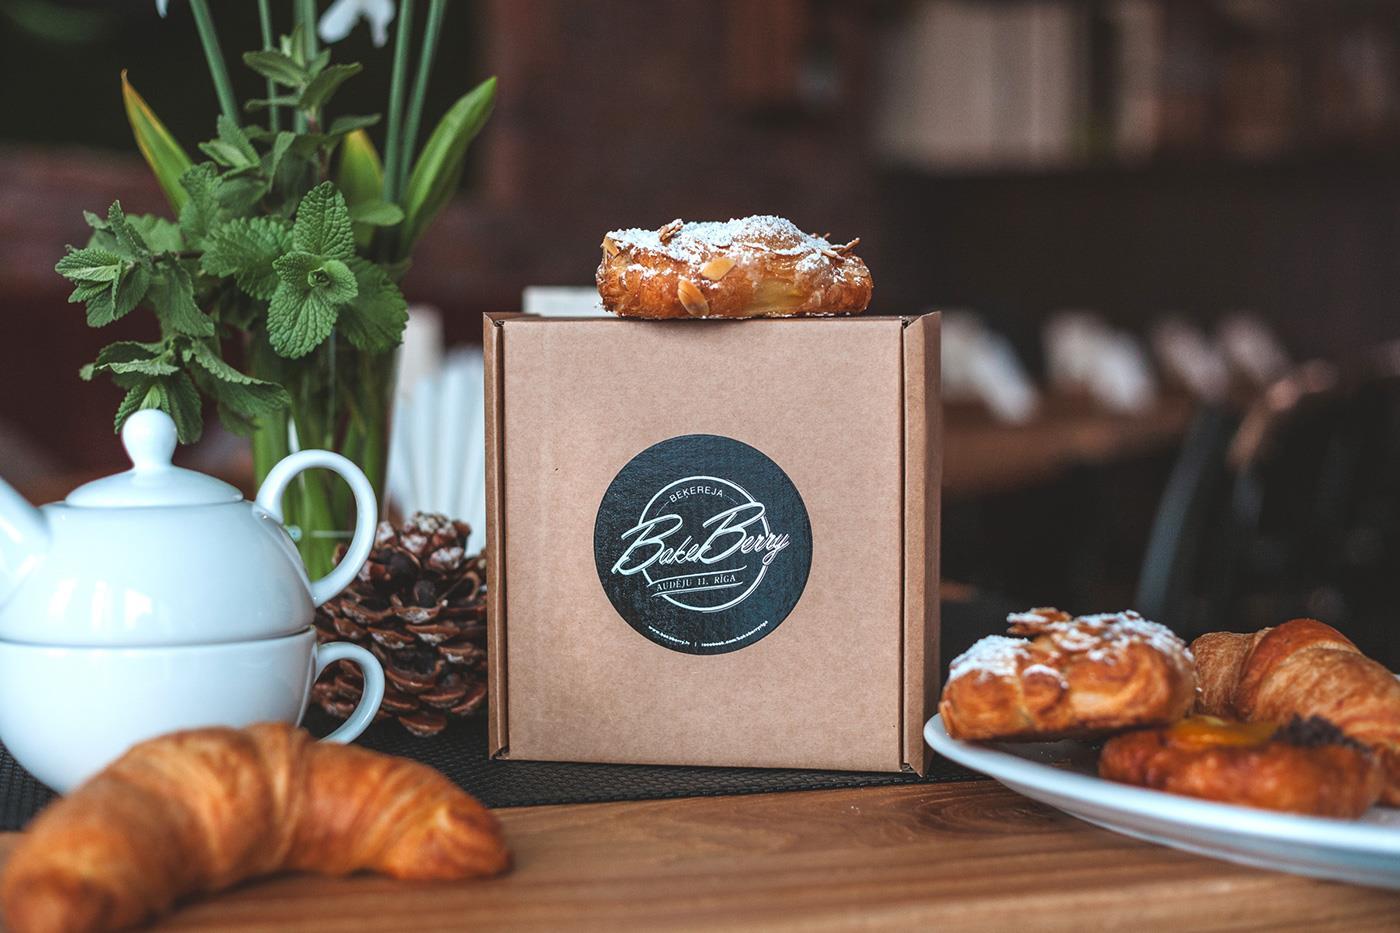 bakeberry面包店品牌设计案例欣赏